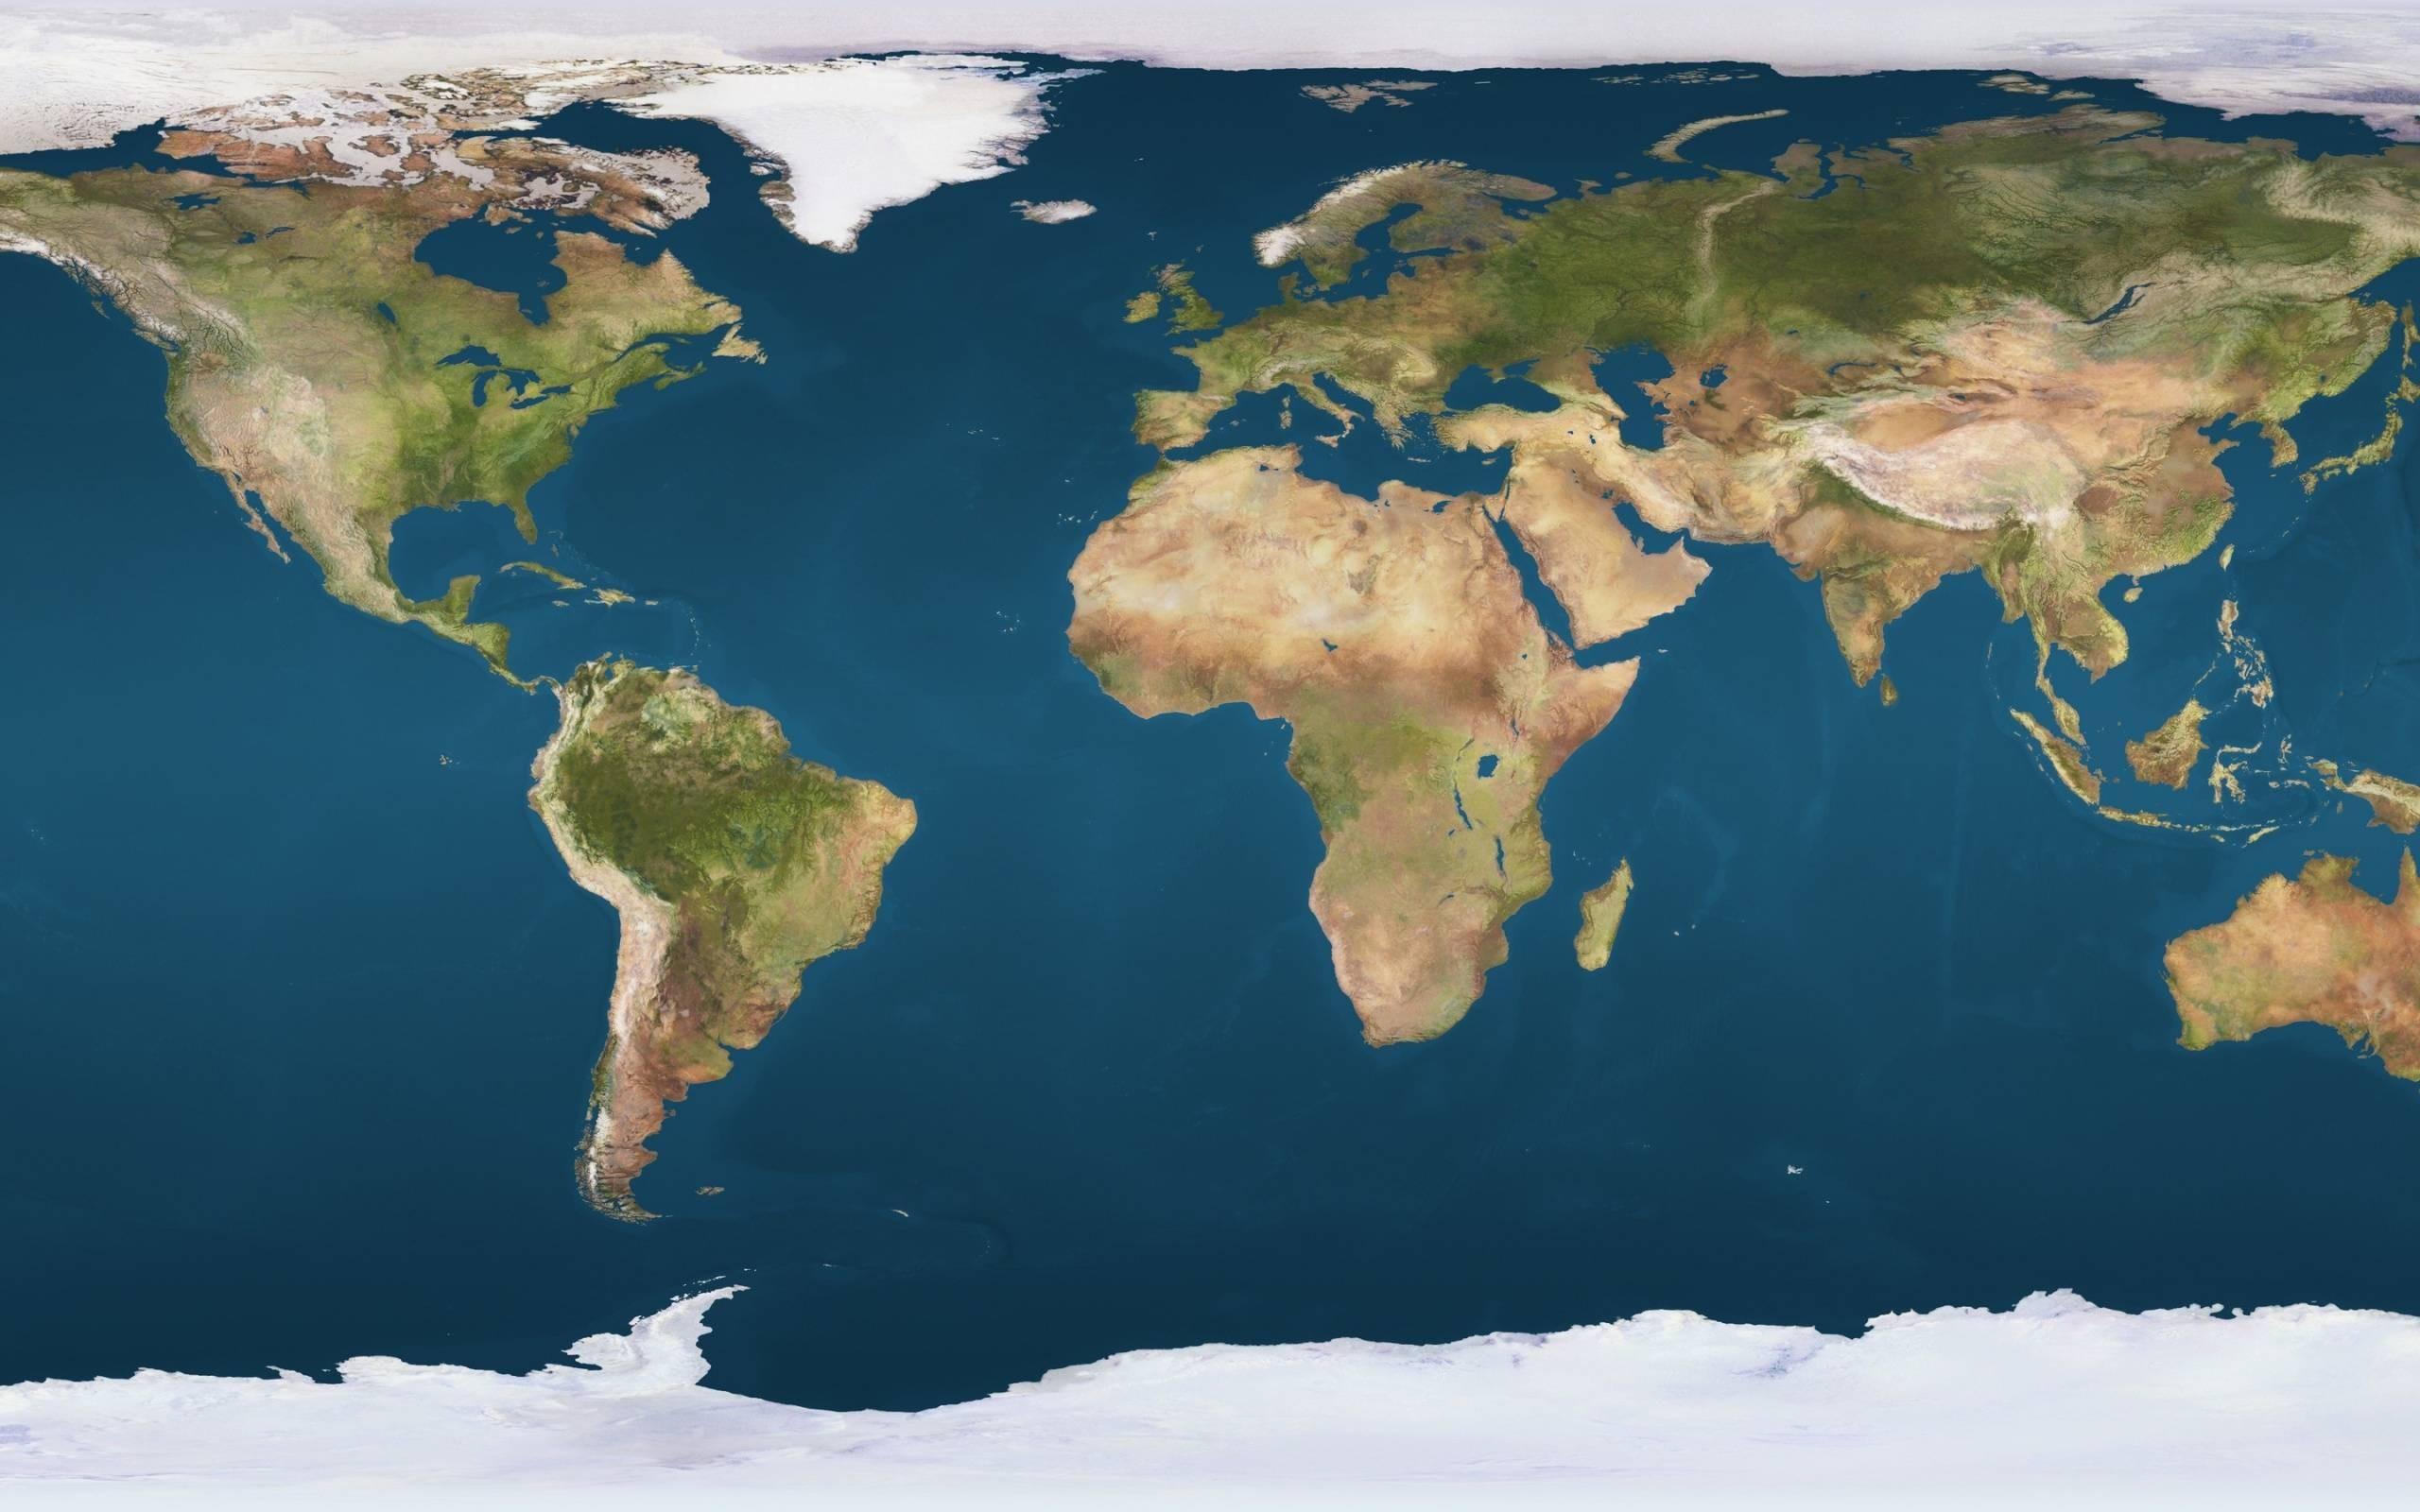 2560x1600 world map wallpaper 2560x1600 for retina · Download · world ...